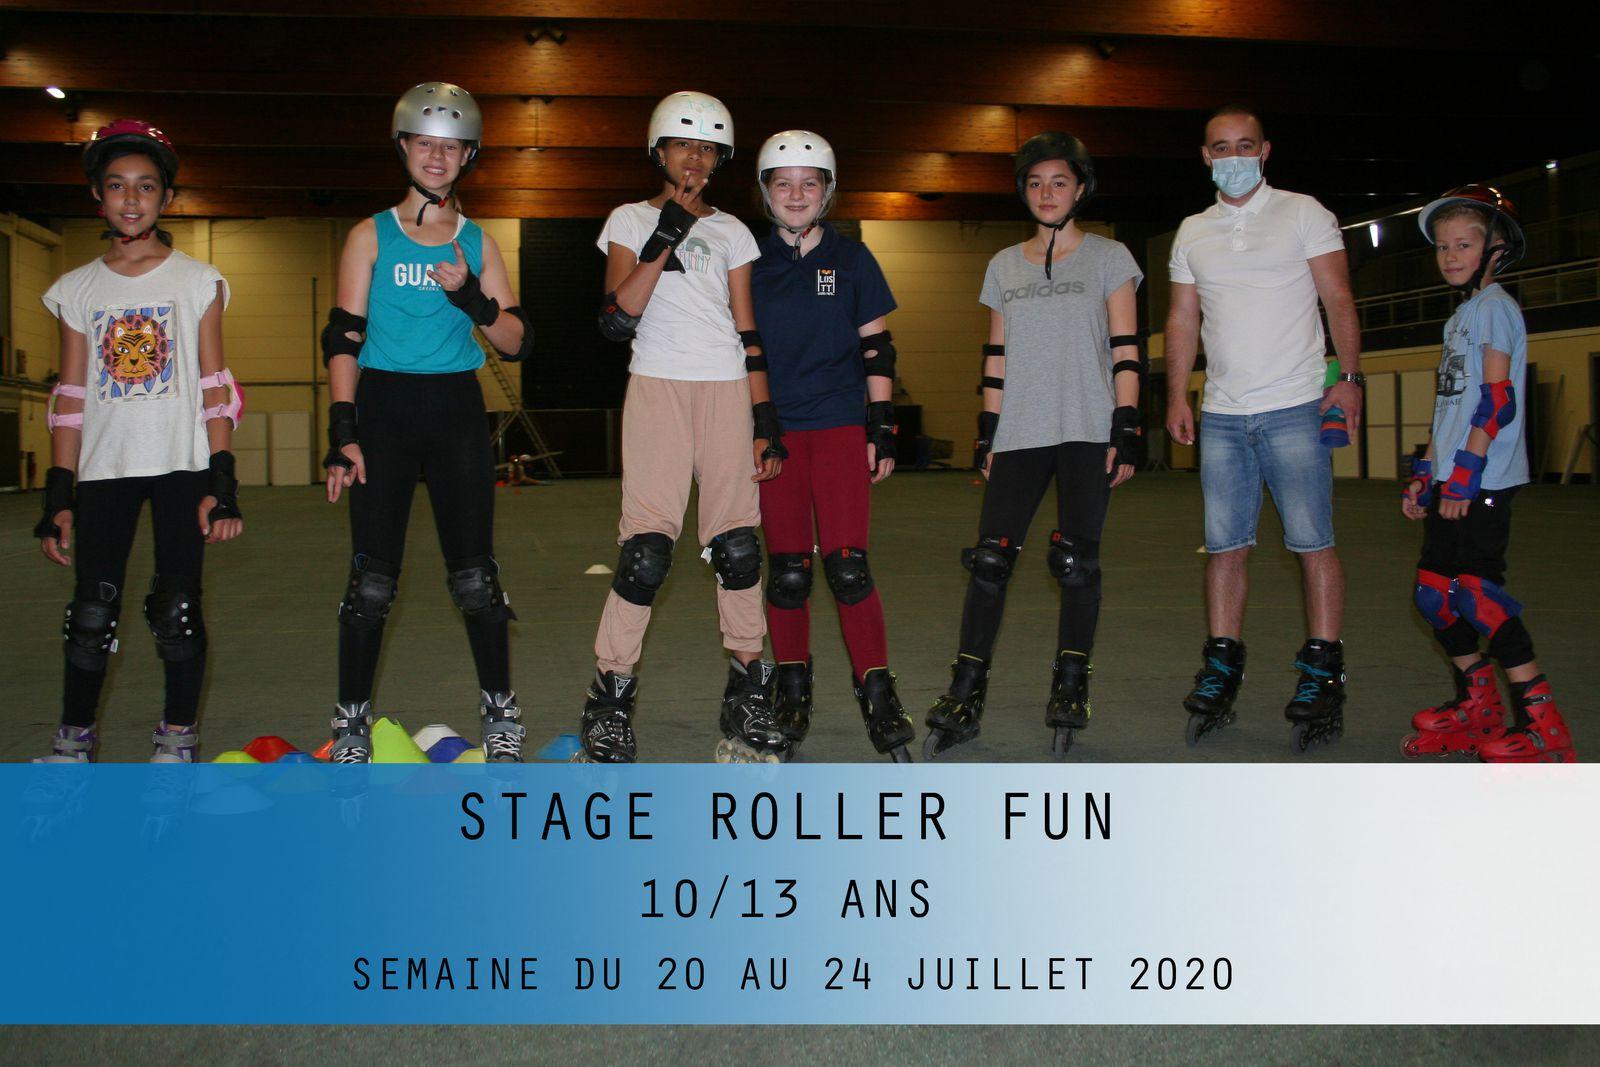 STAGE ROLLER FUN-10/13 ANS-SEMAINE DU 20 AU 24 JUILLET 2020